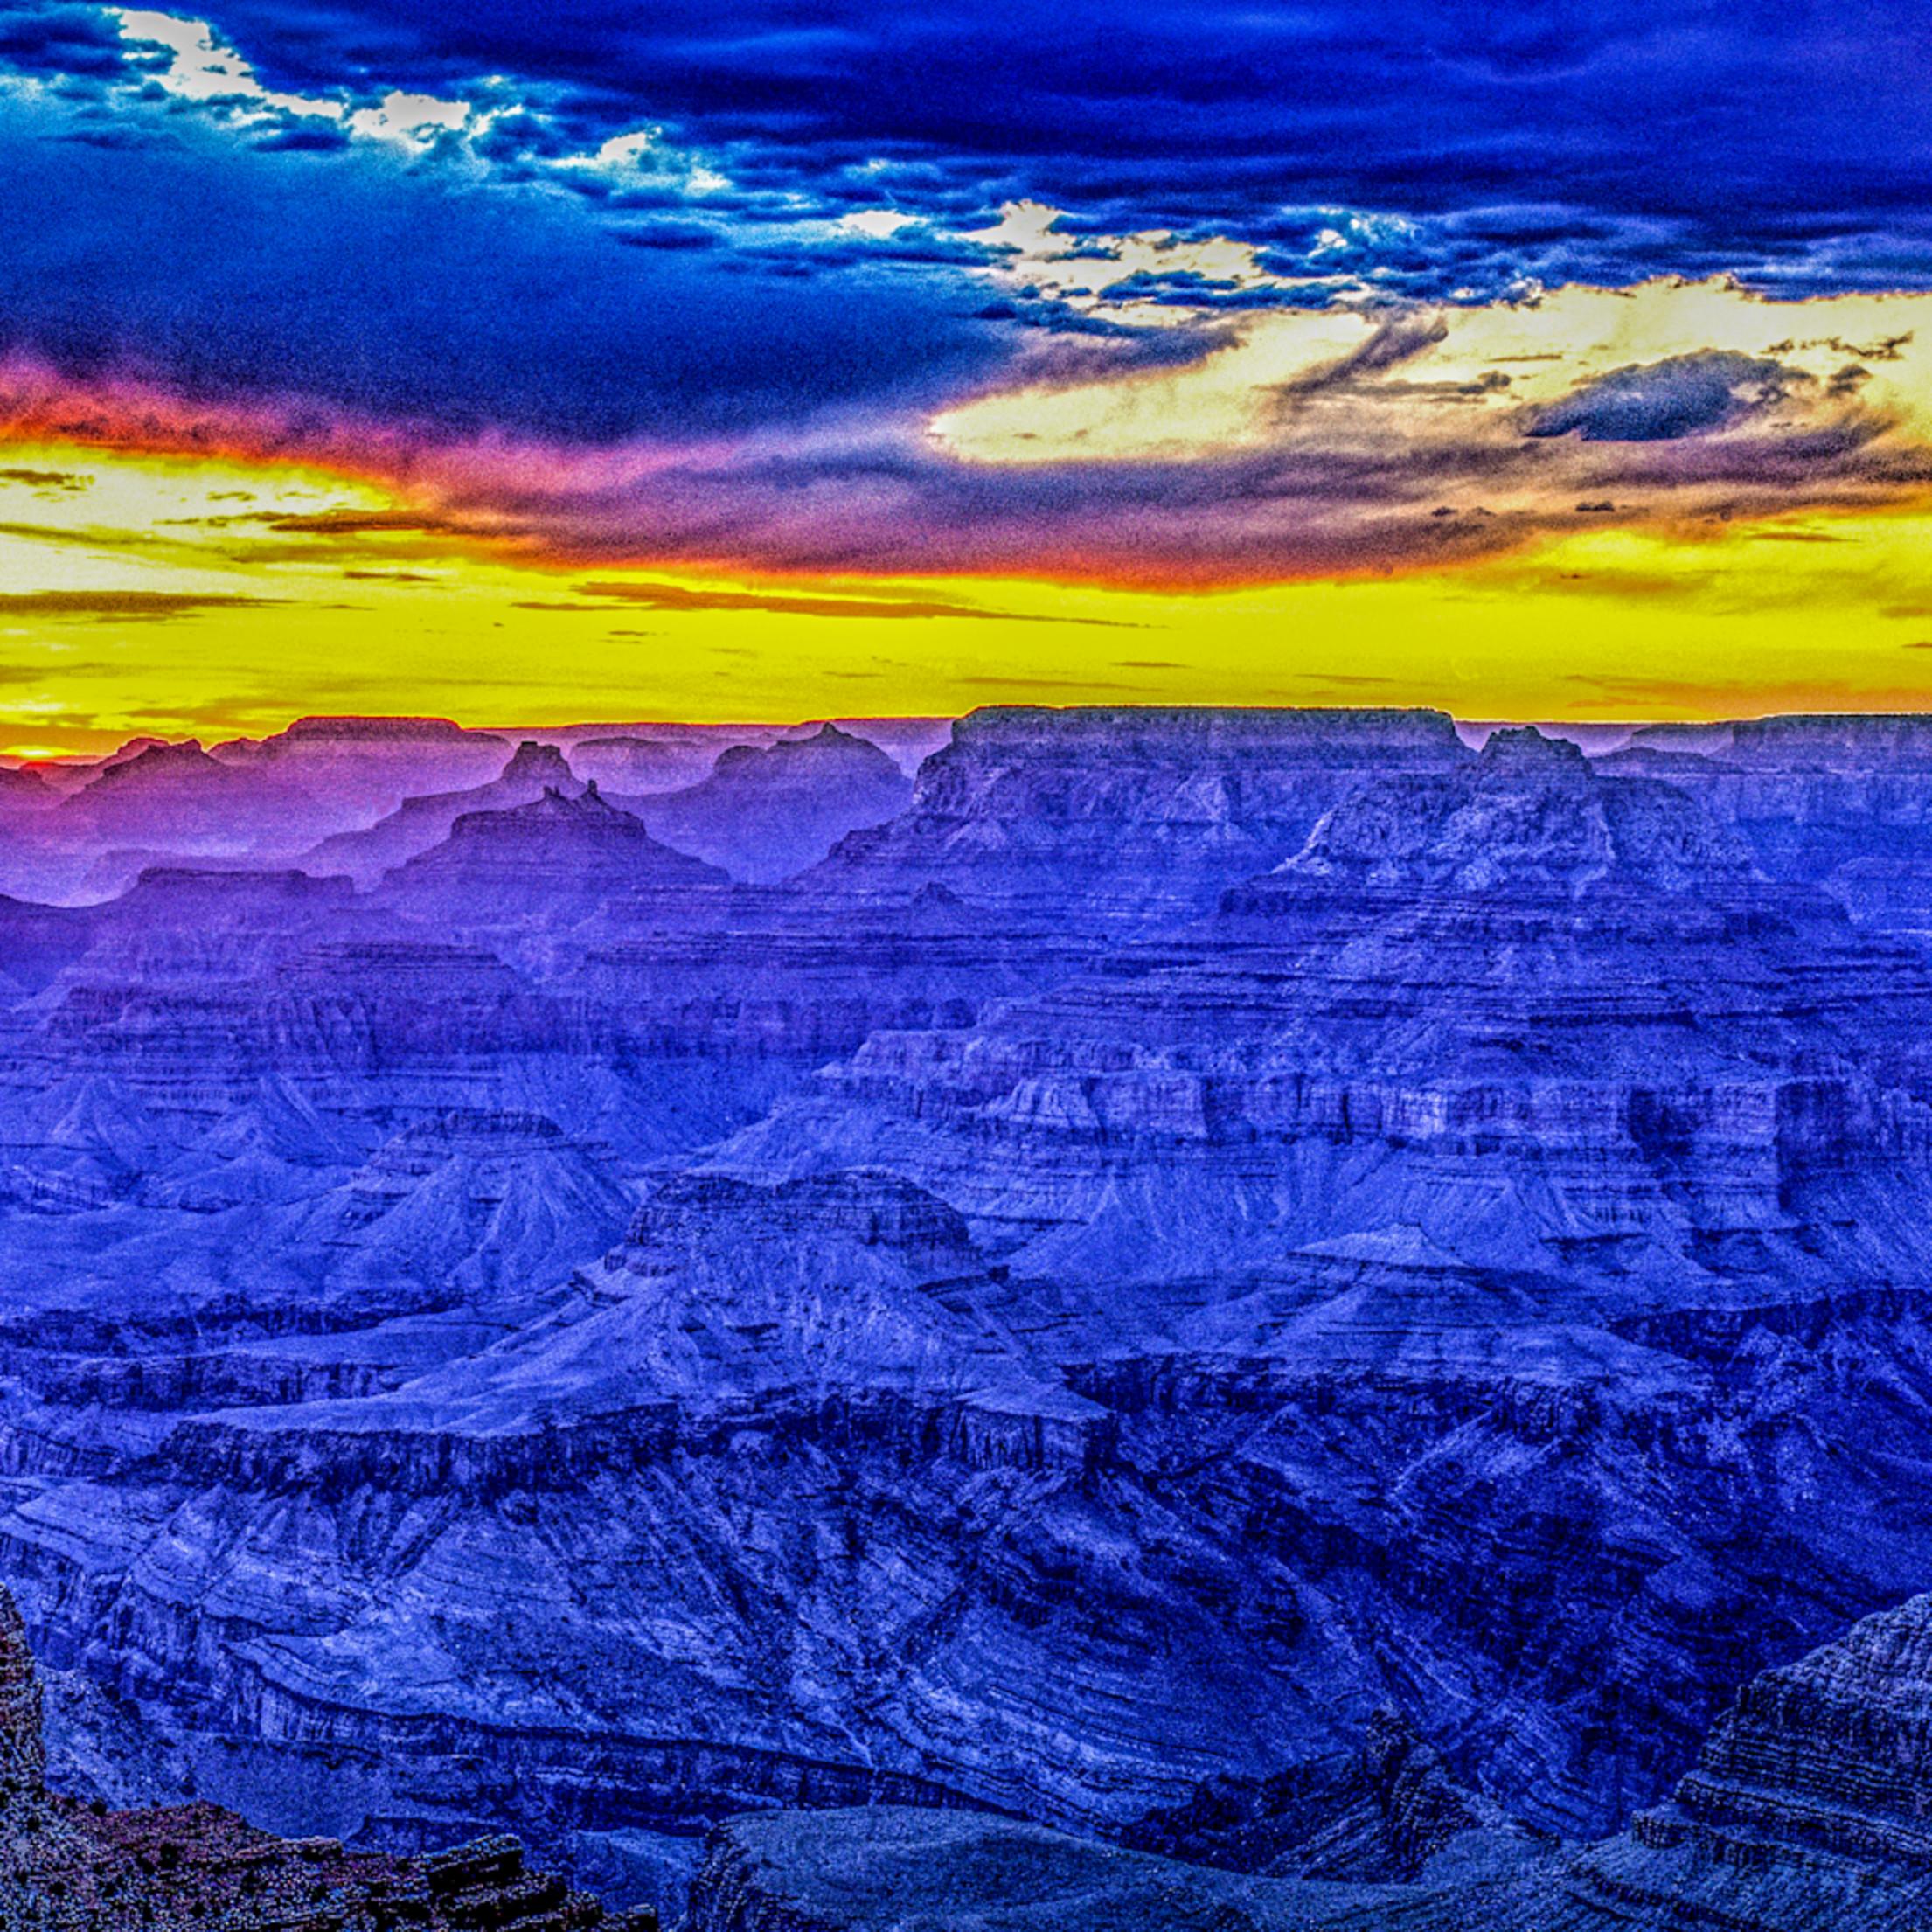 Grand canyon twilight az qd3vs6